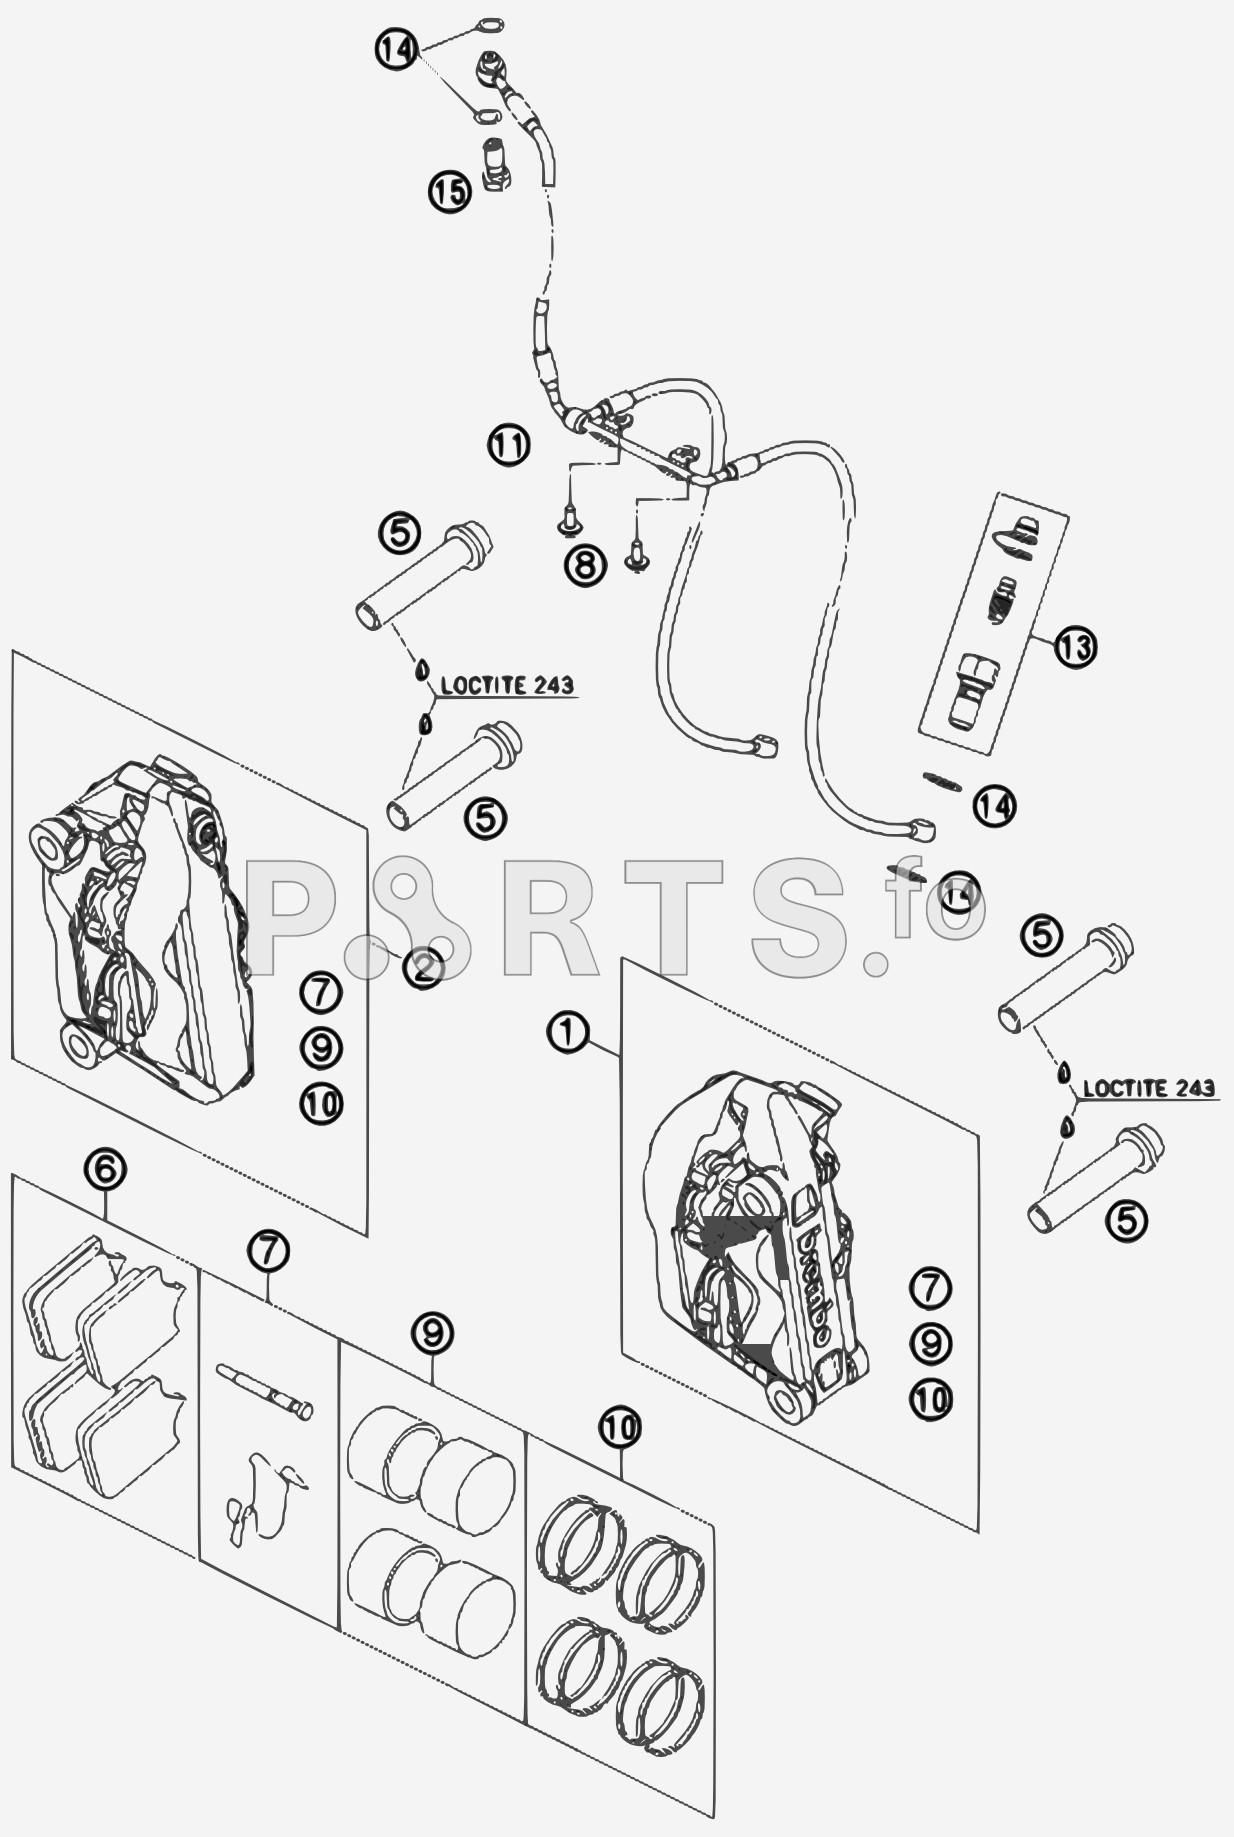 caliper parts diagram parts ktm motorcycle 990 supermoto t